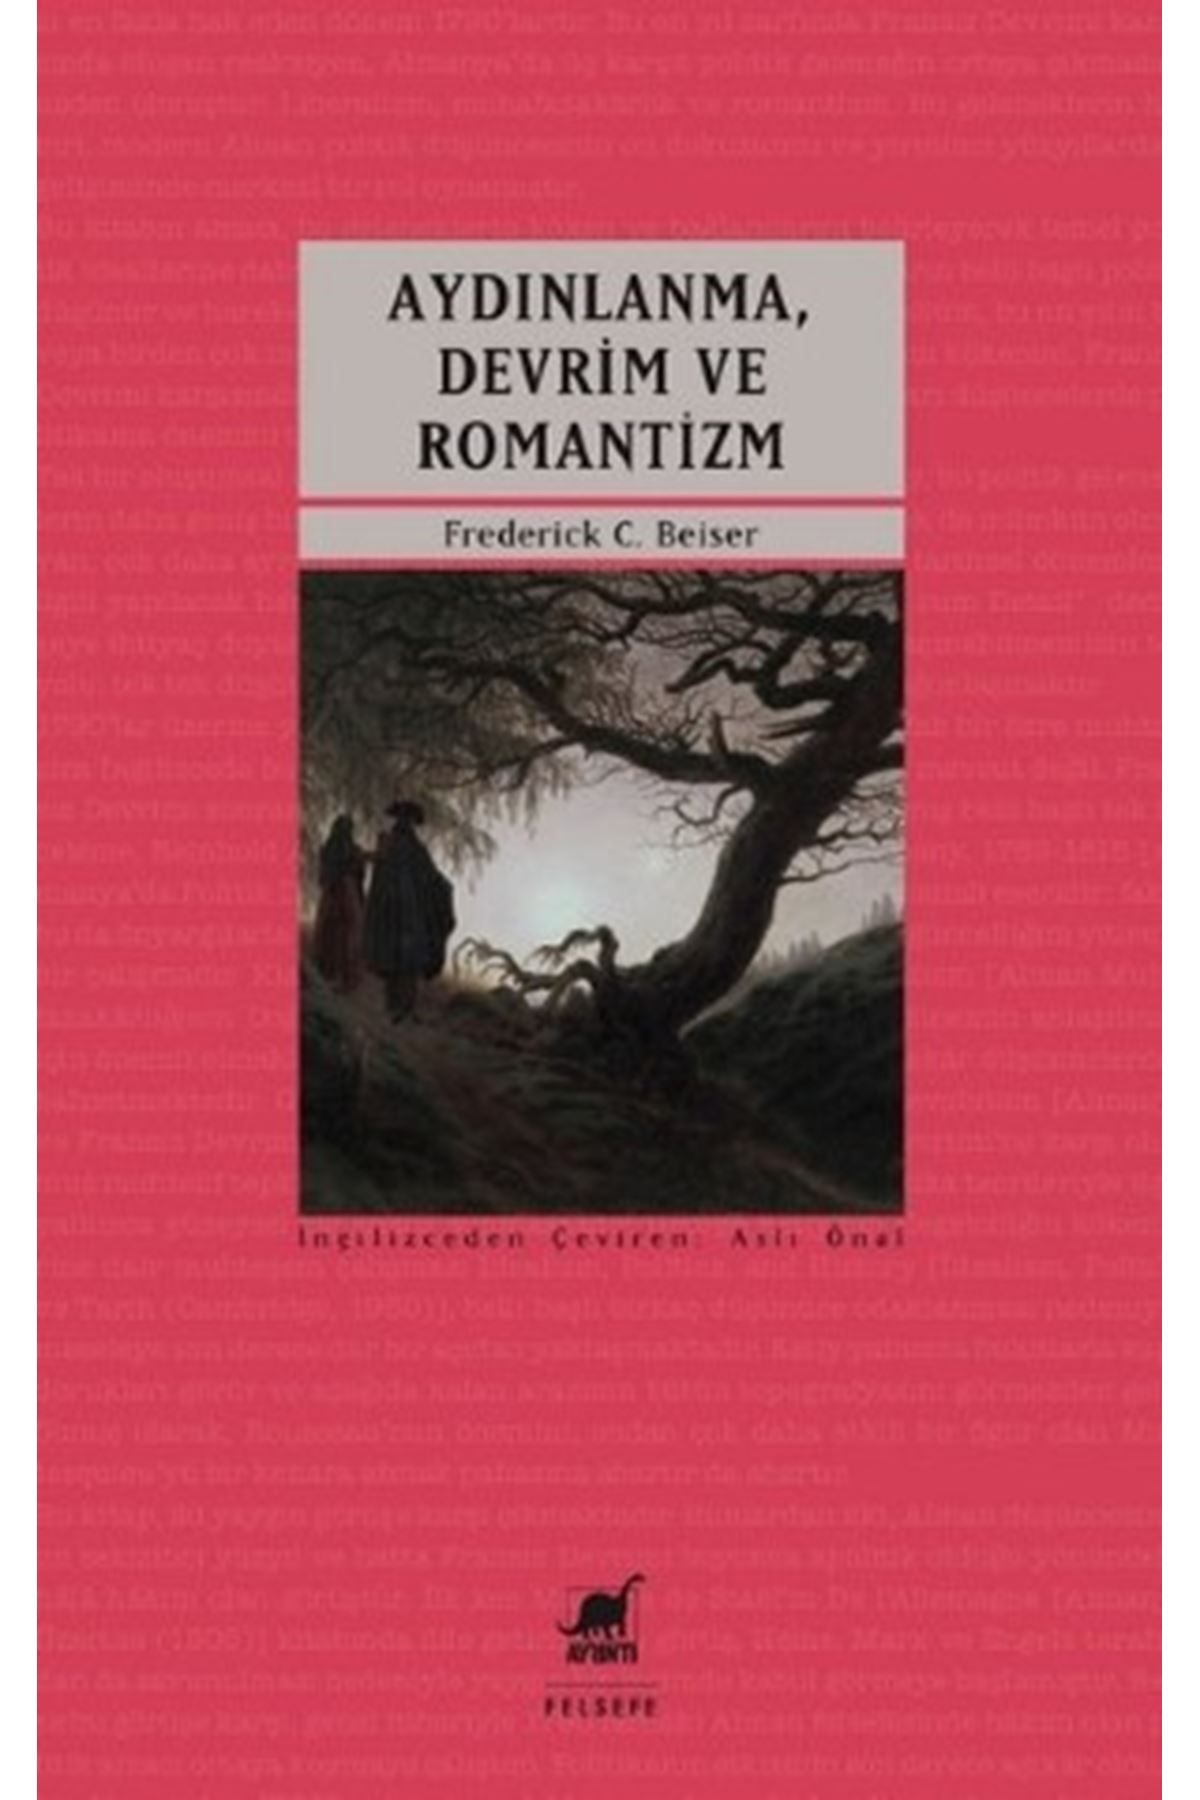 FREDERİCK C. BEİSER - AYDINLANMA DEVRİM VE ROMANTİZM